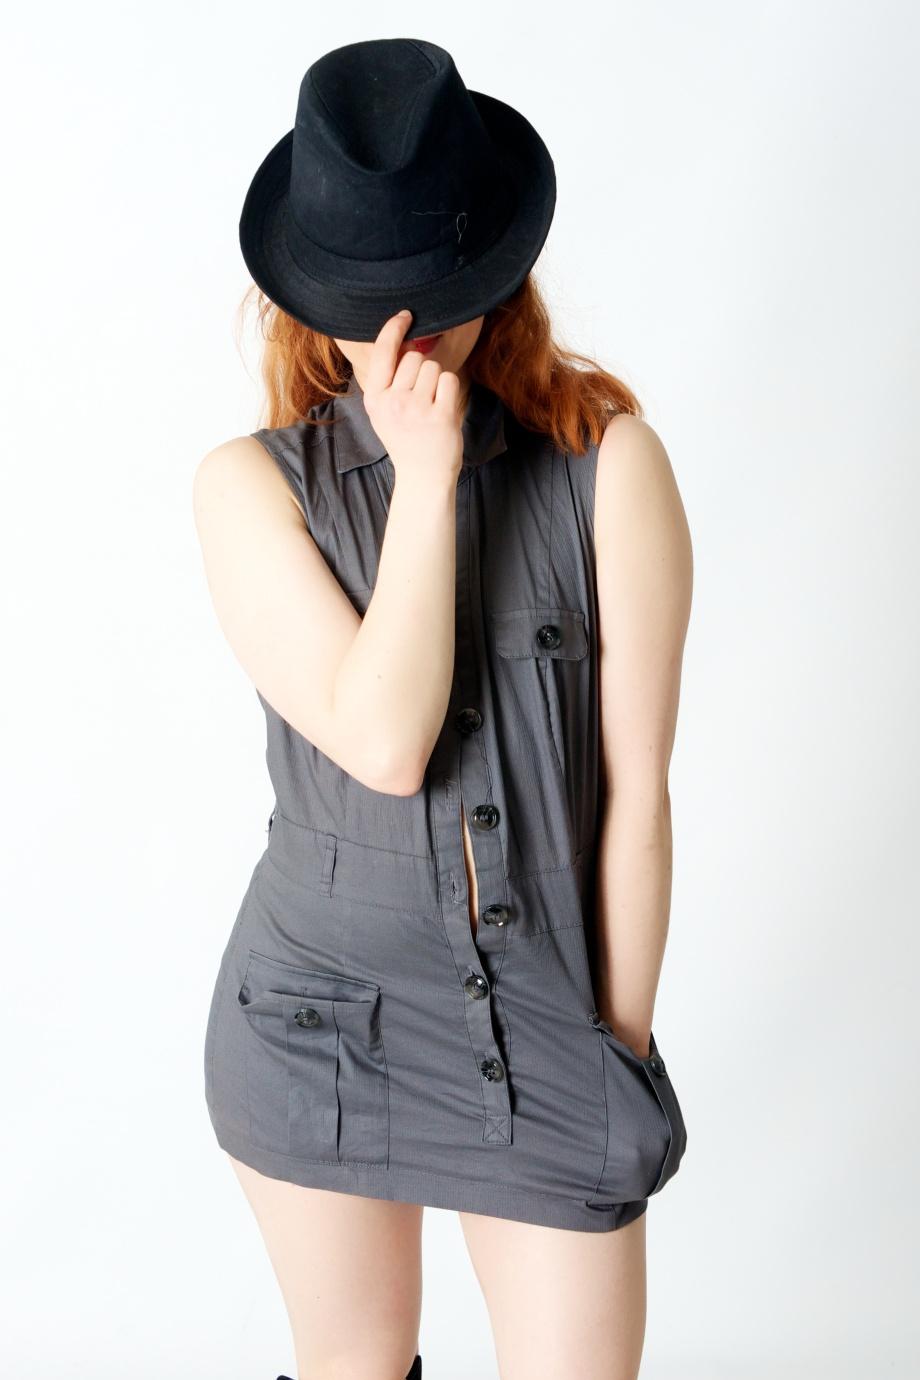 Roksi, Applecore, Cork, Model, Studio, Photoshoot, Glamour, Portrait, red hair, hat